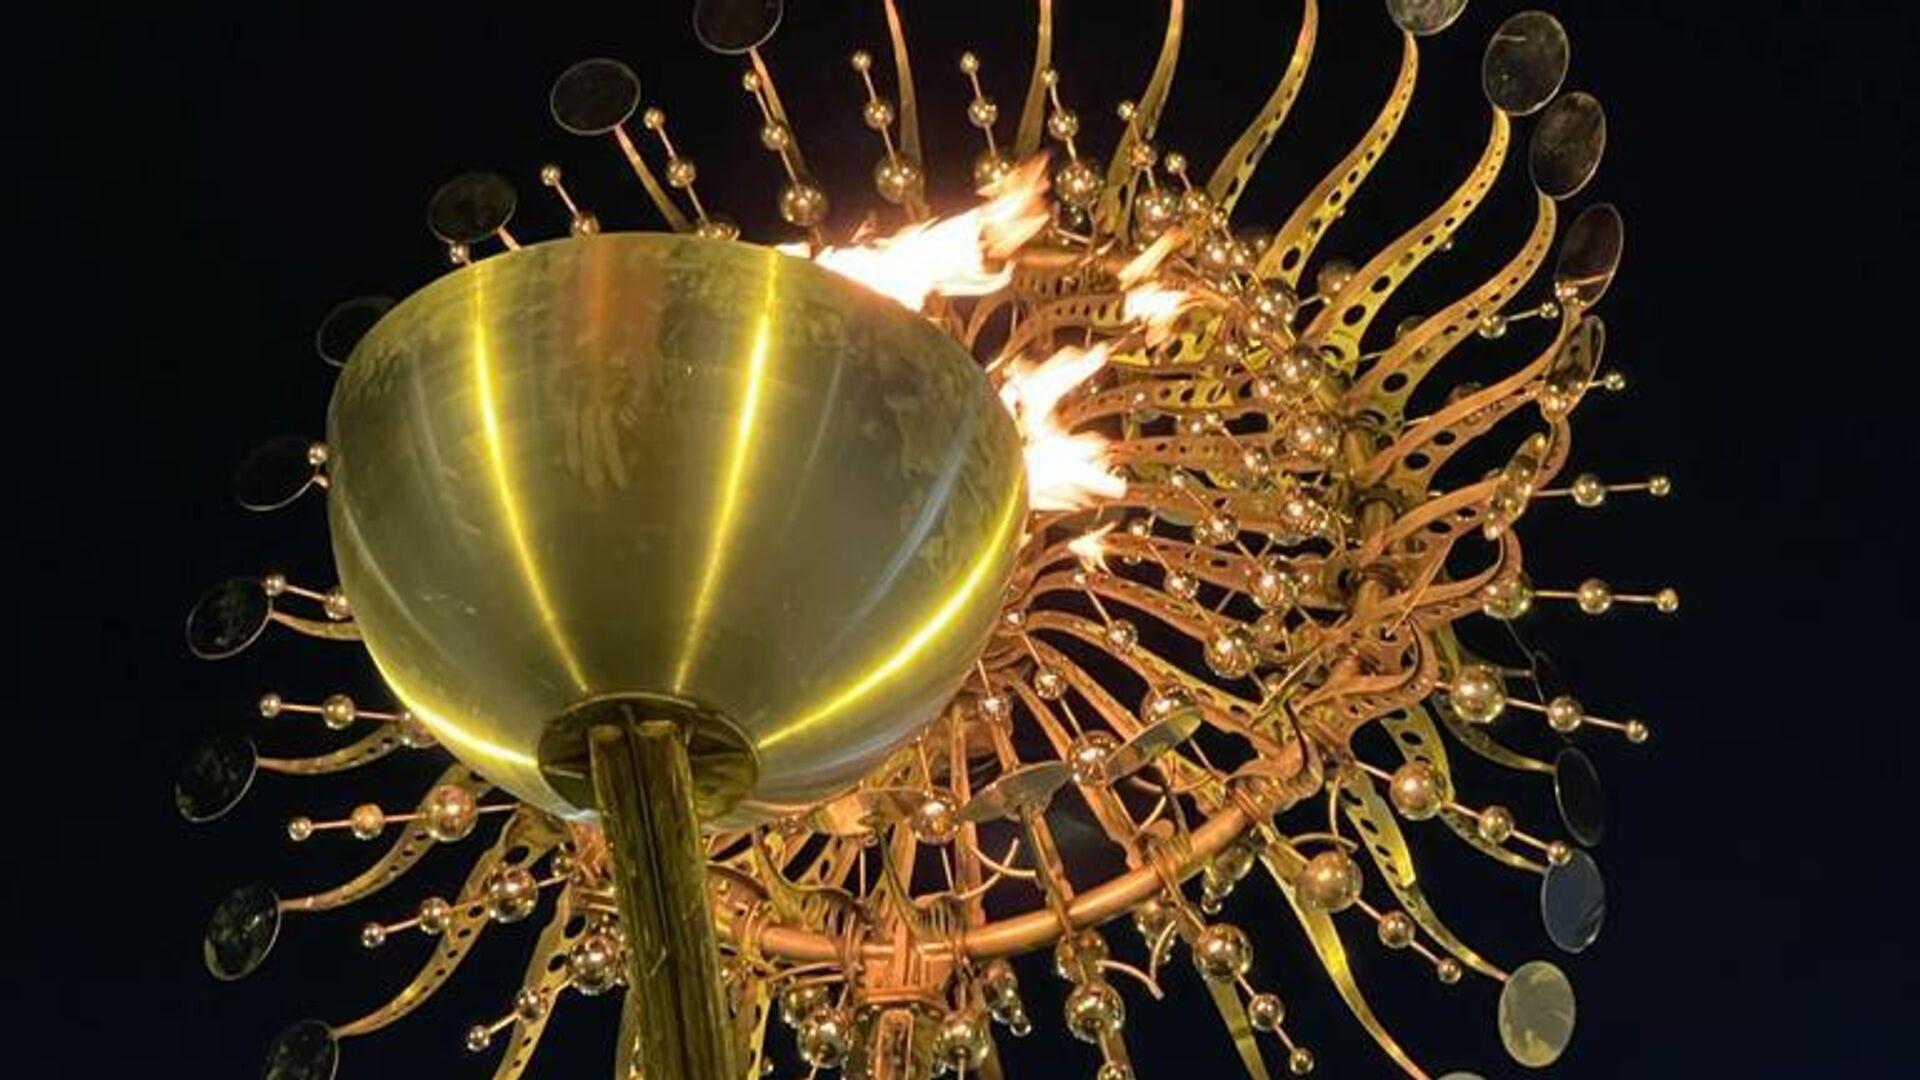 La llama olímpica en Río de Janeiro, Brasil - Sputnik Mundo, 1920, 23.07.2021